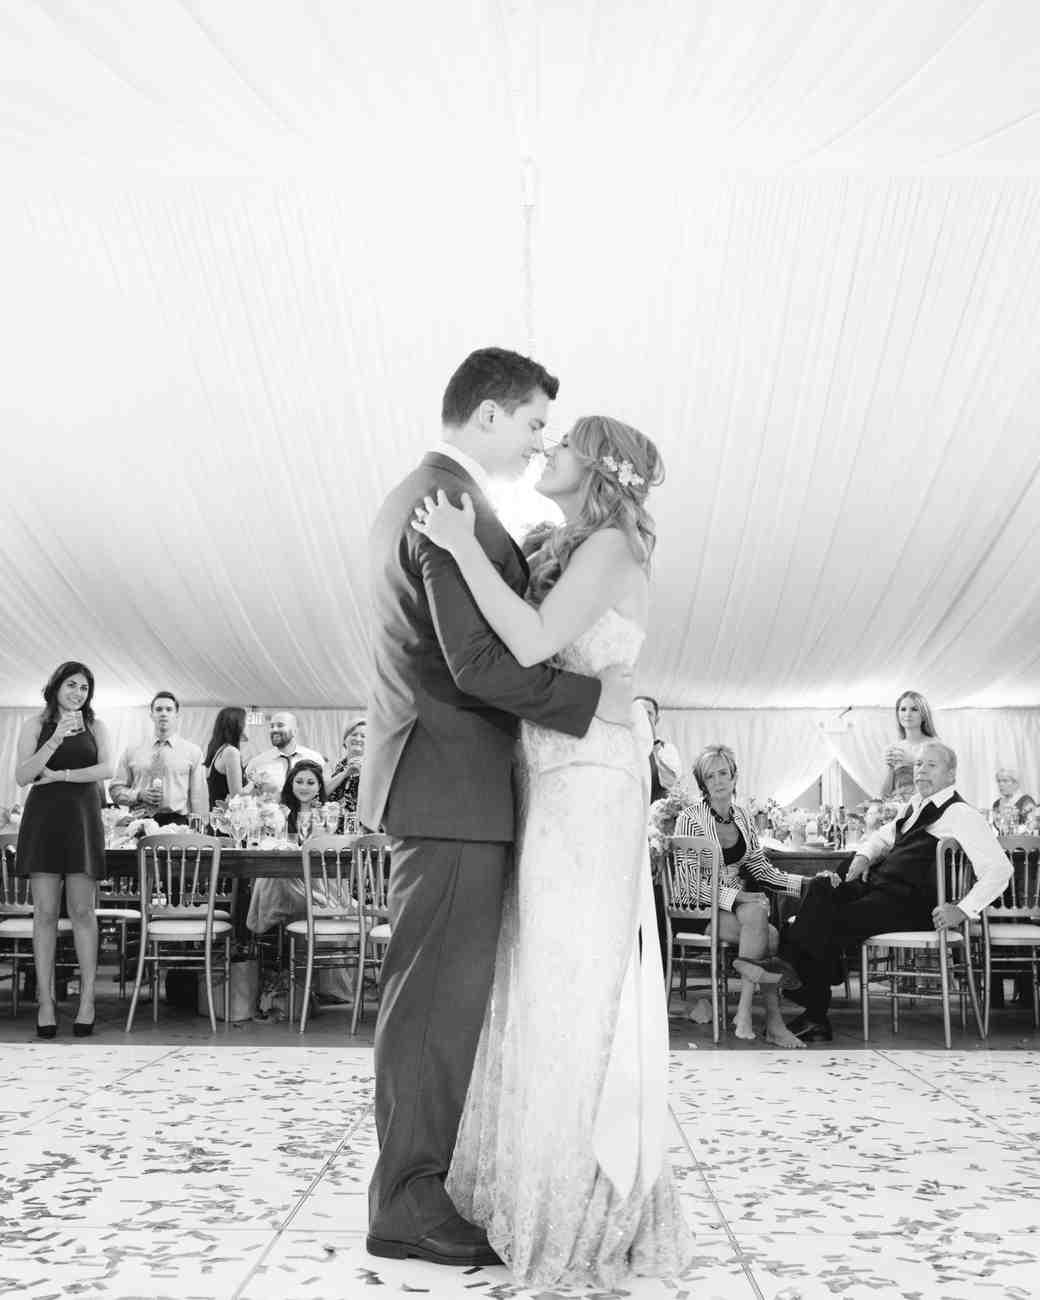 alex-brandon-wedding-dance-110-s111338-0714.jpg